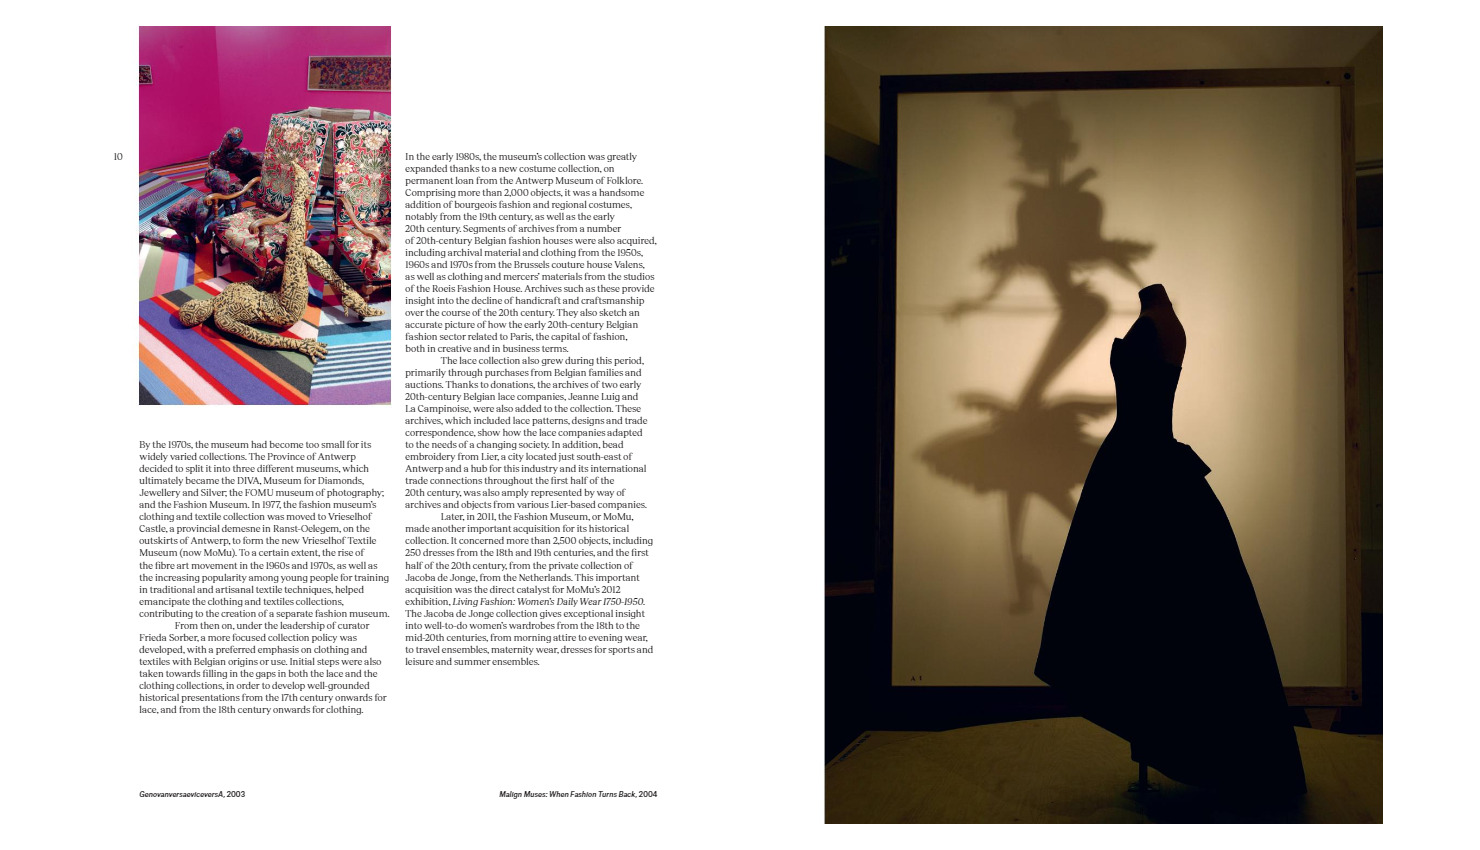 fashion-moda-arte-libros-momu-magazinehorse